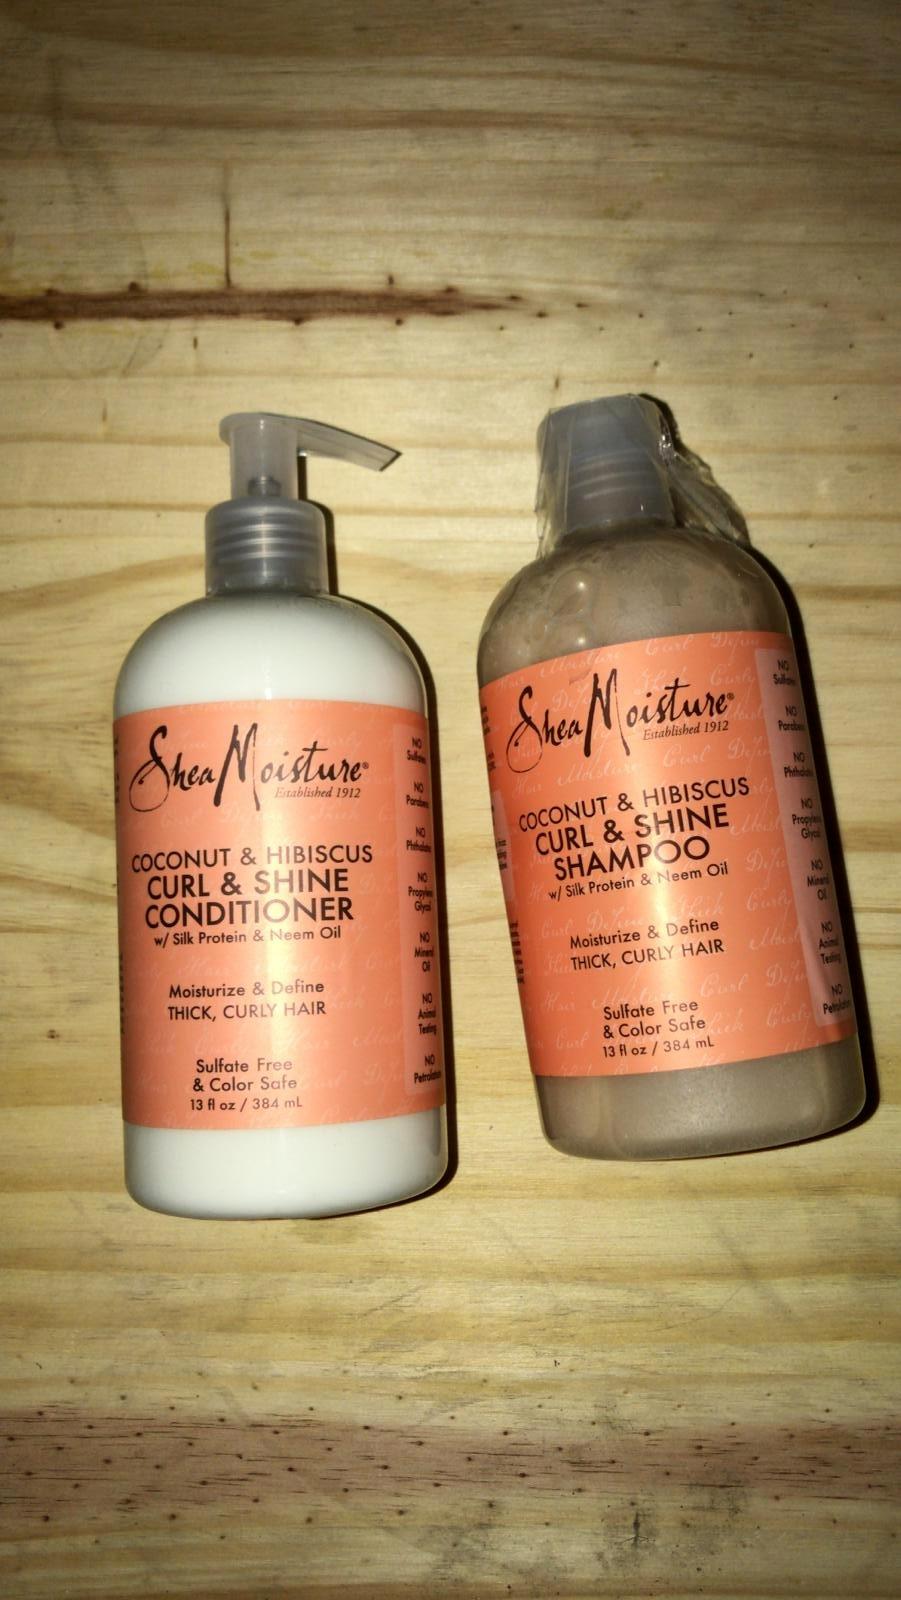 Shea Moisture Coconut & Hibiscus Curl & Shine Shampoo and Co